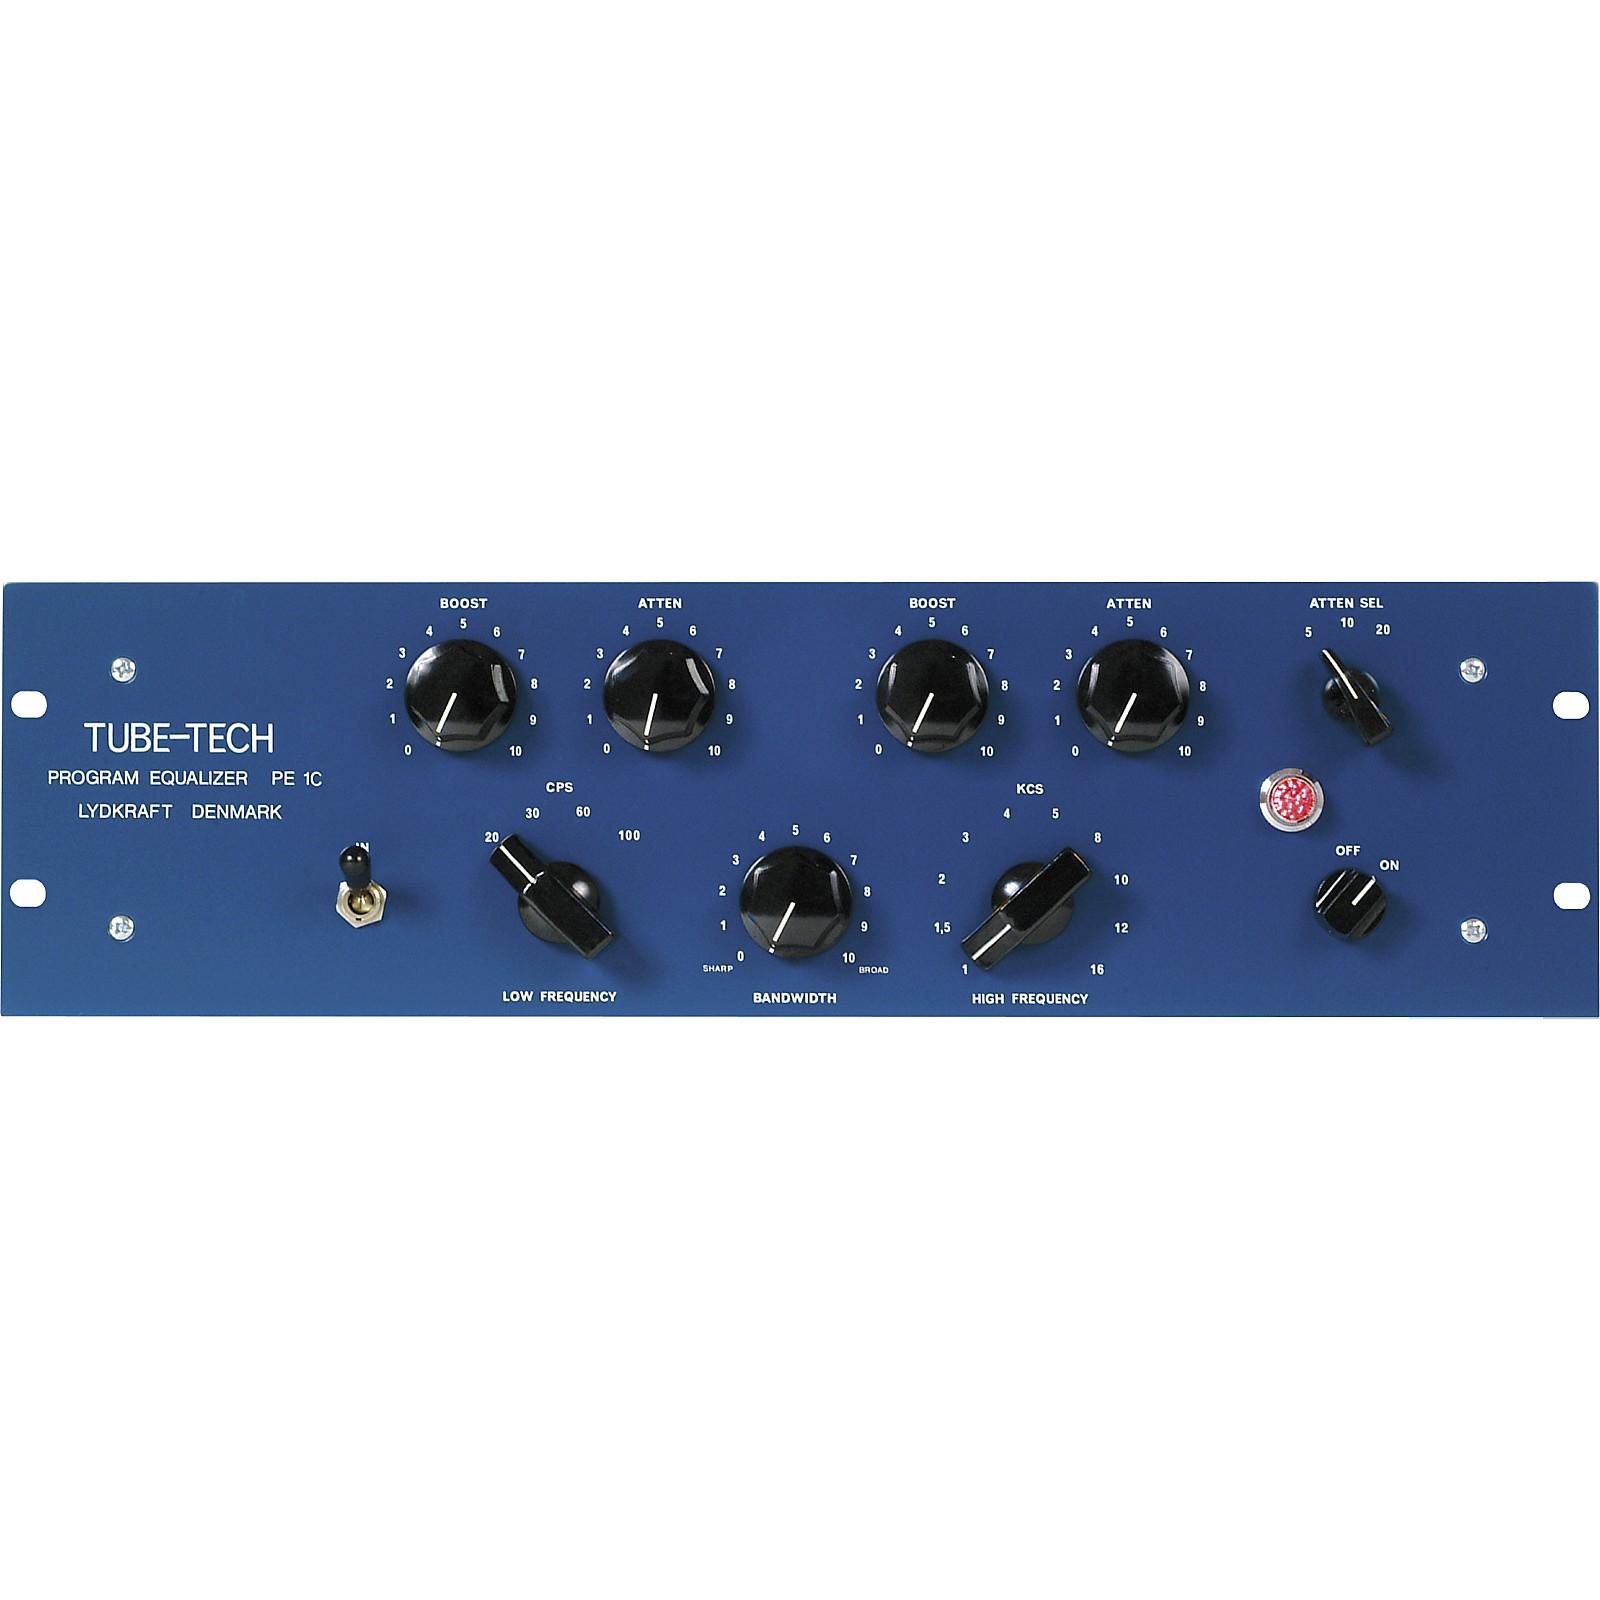 Tube-Tech PE-1C Program Equalizer